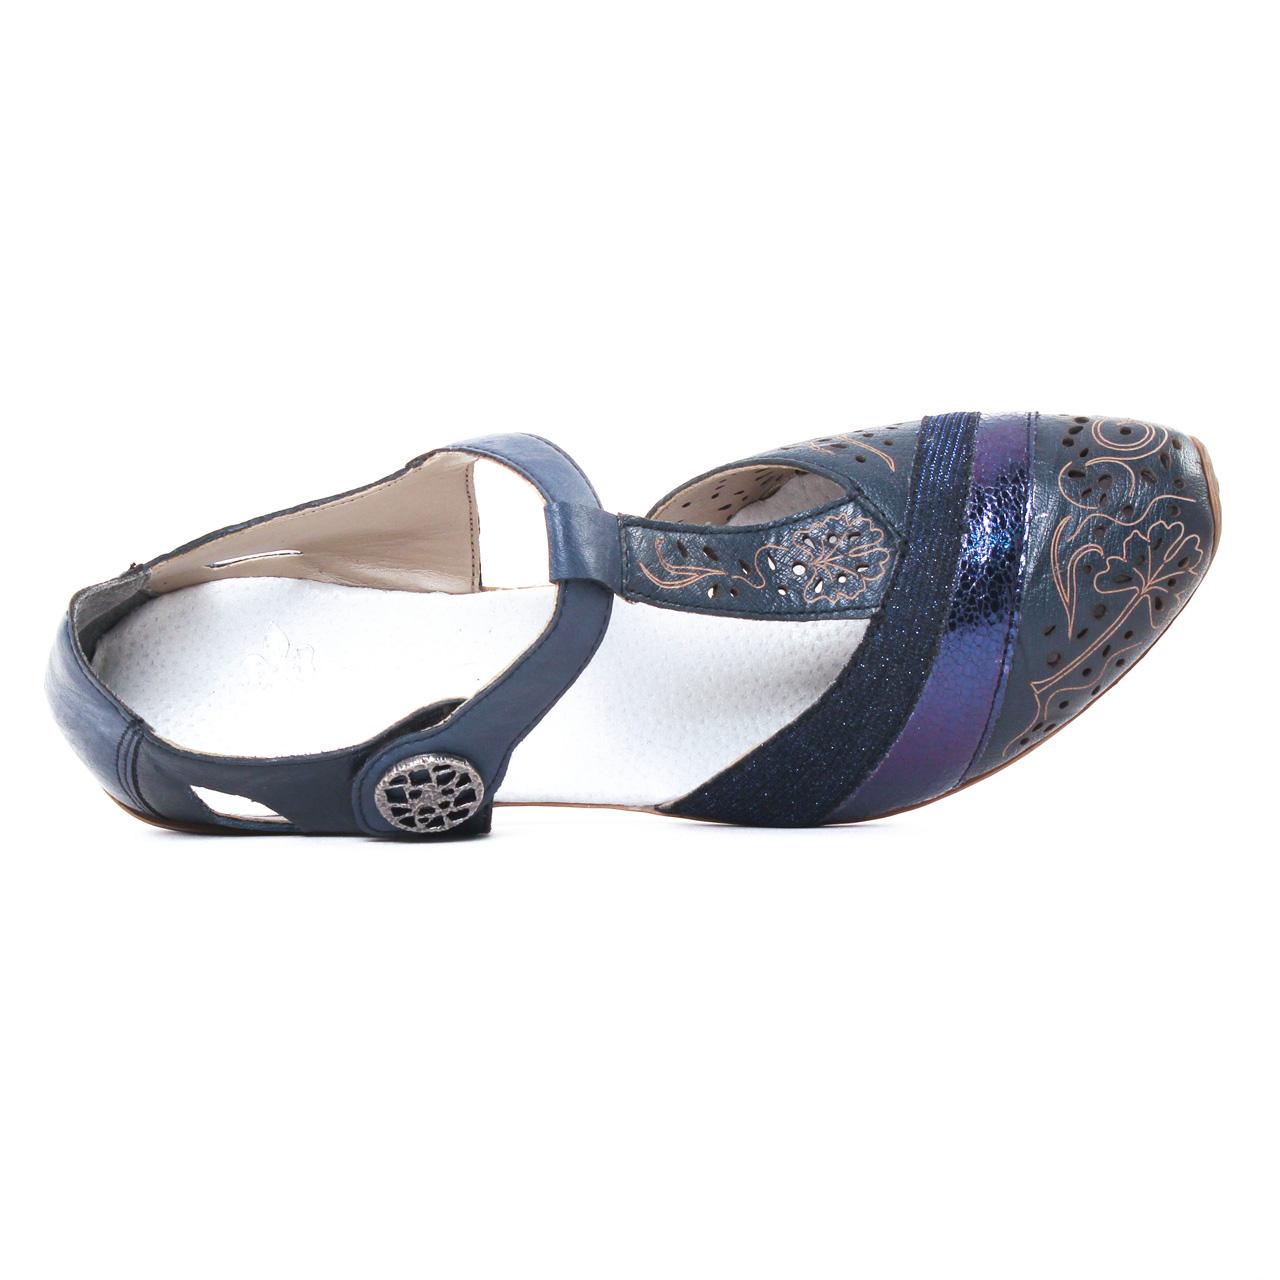 Rieker 49751 Royal | escarpin trotteur bleu marine printemps